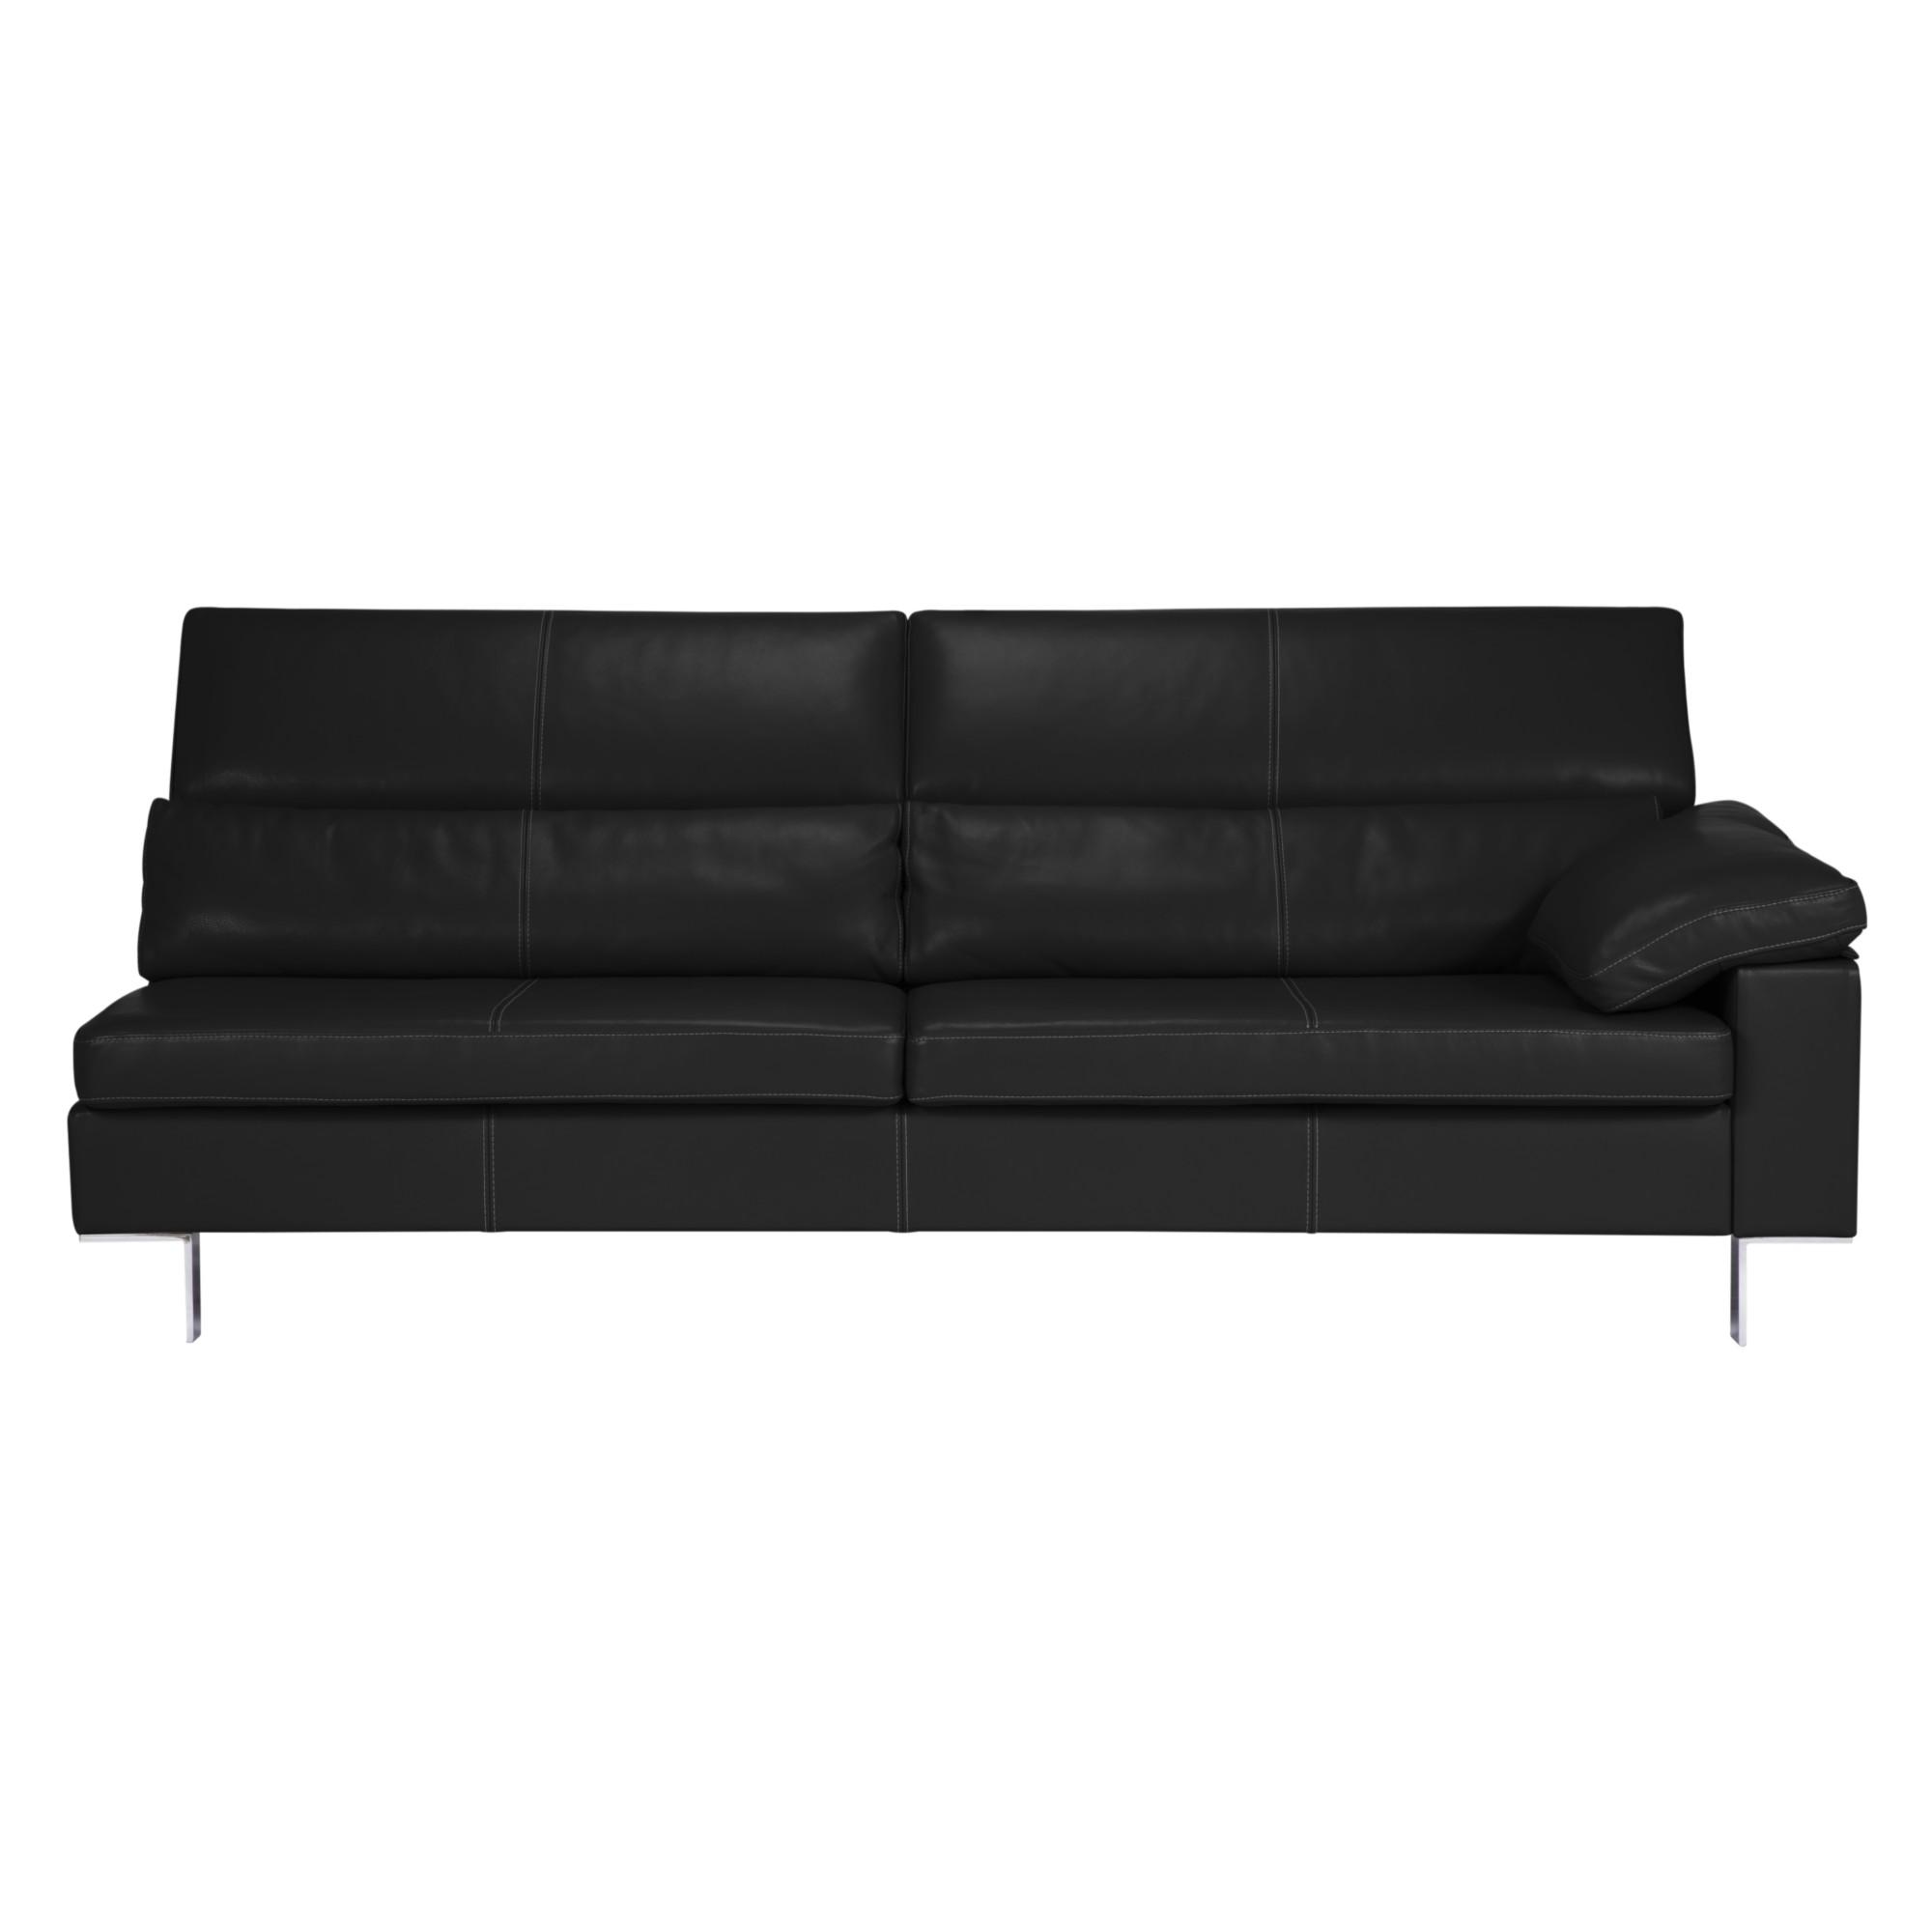 John Lewis Baccara RHF Grand Sofa Unit